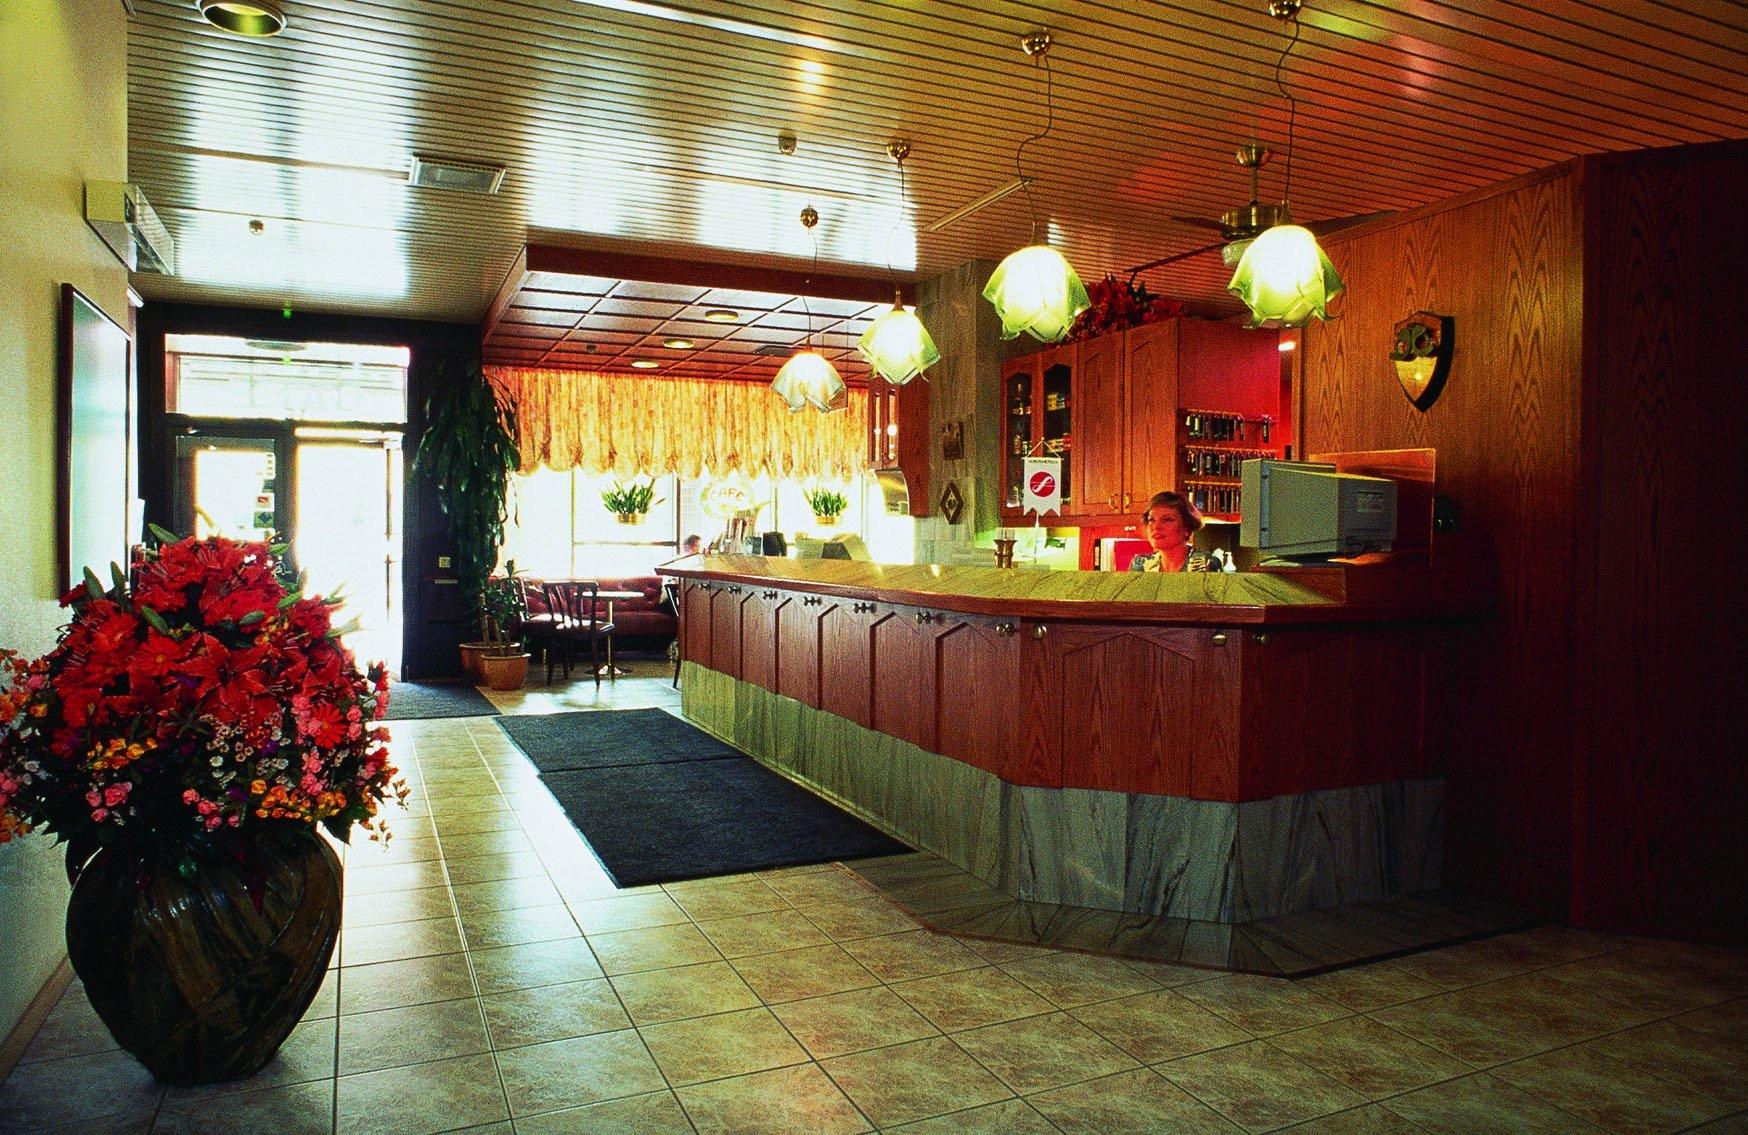 Rikala Original by Sokos Hotel